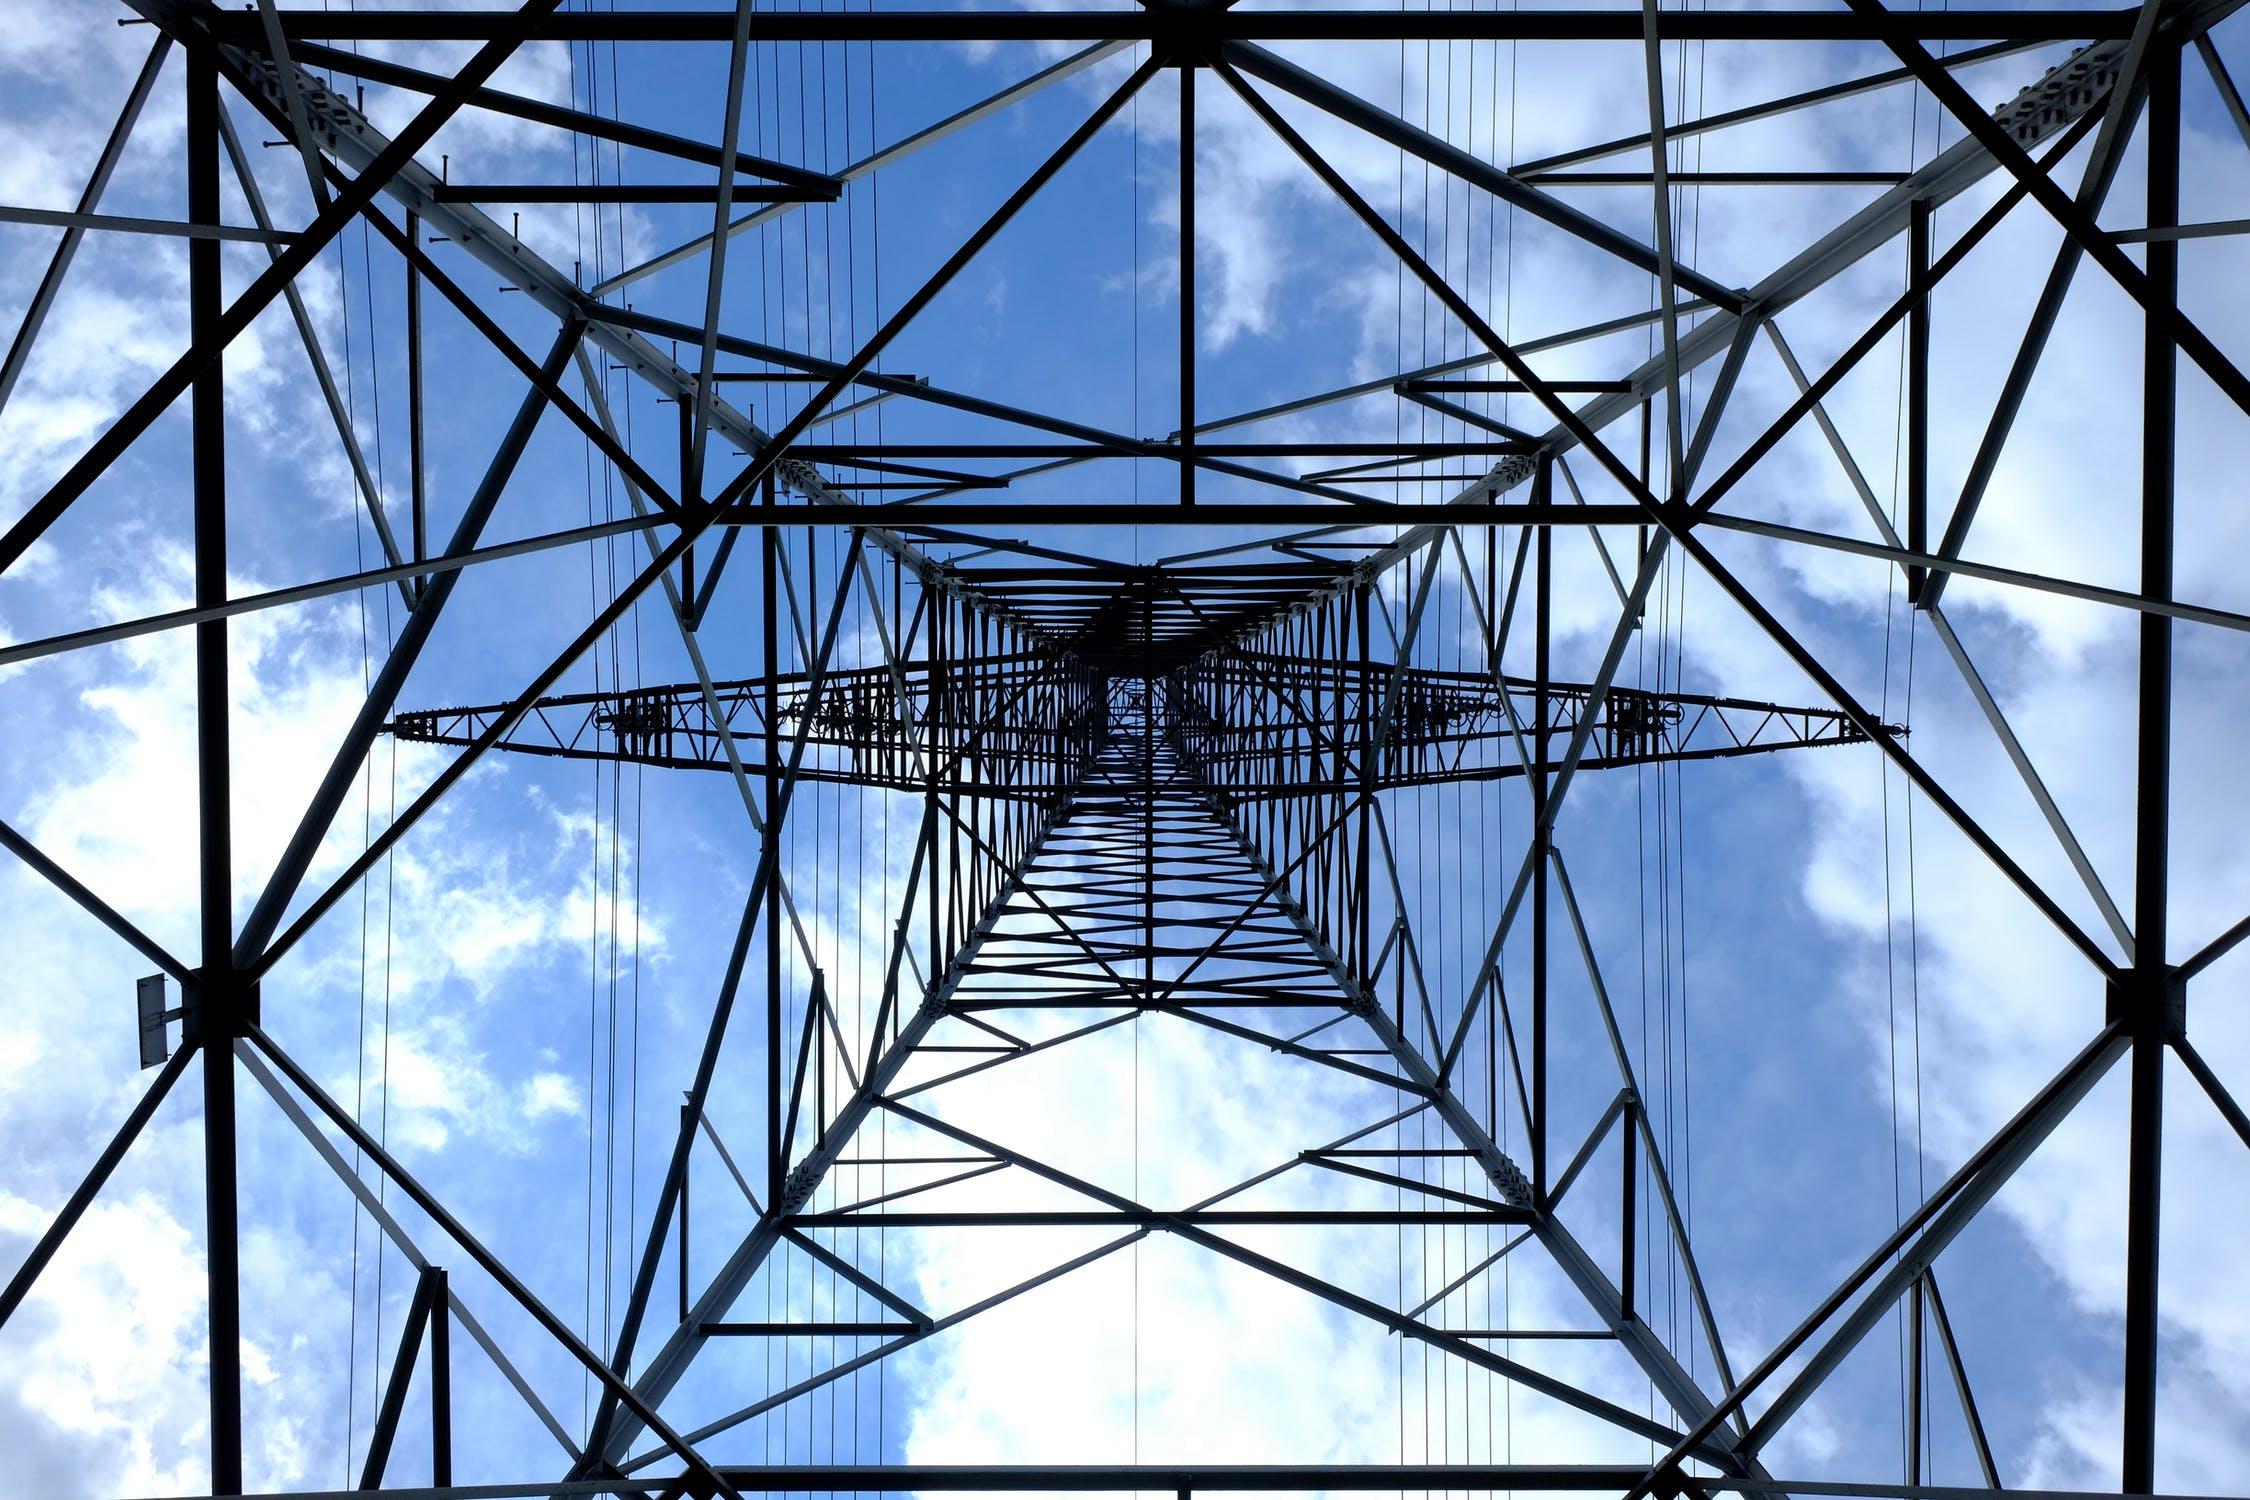 pylon-current-electricity-strommast-159279[1]